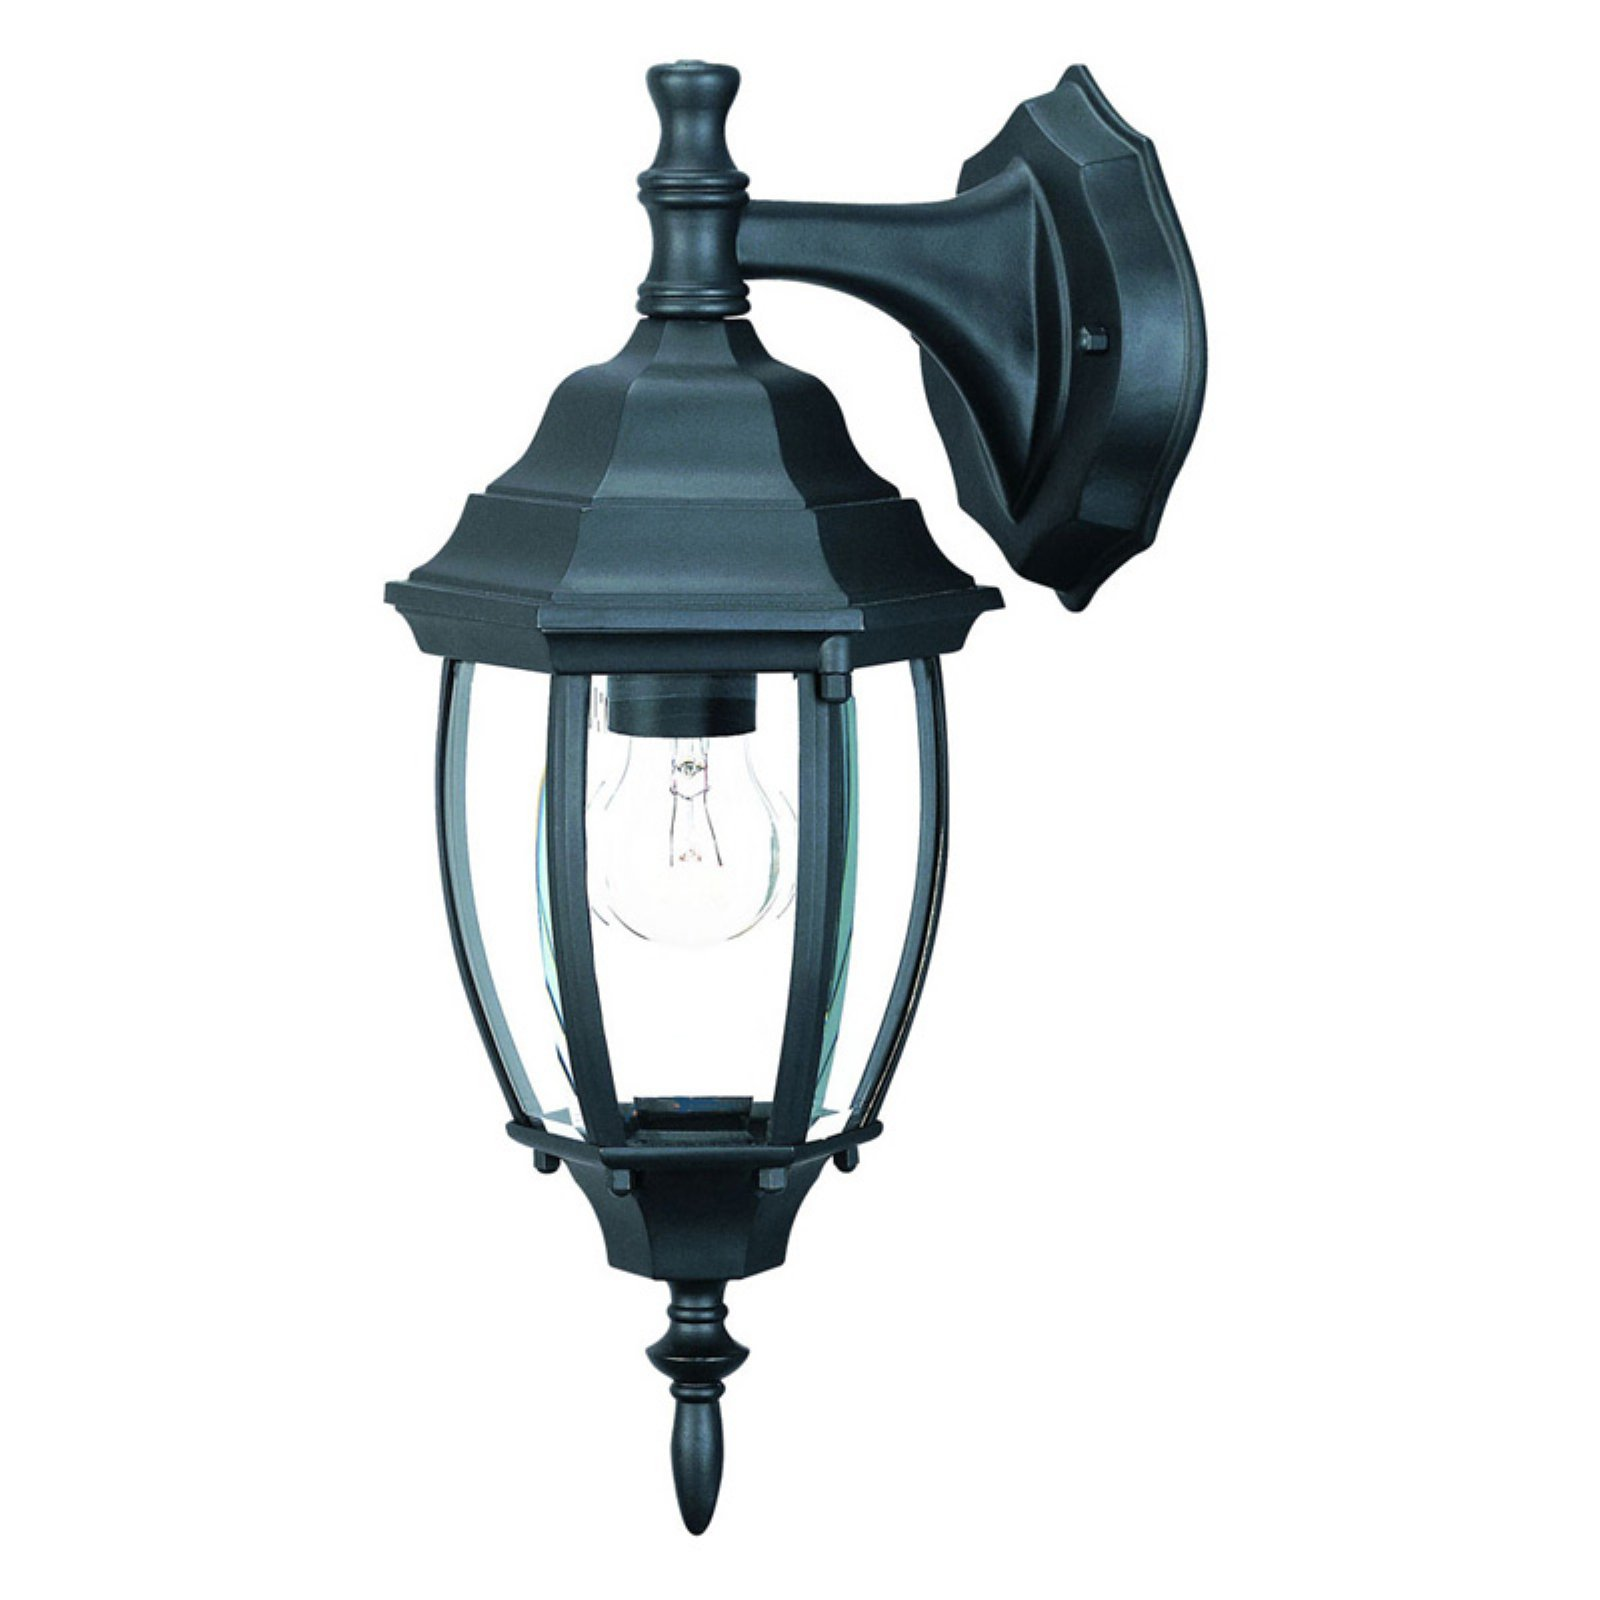 Acclaim Lighting Wexford 1 Light Outdoor Wall Mount Light Fixture